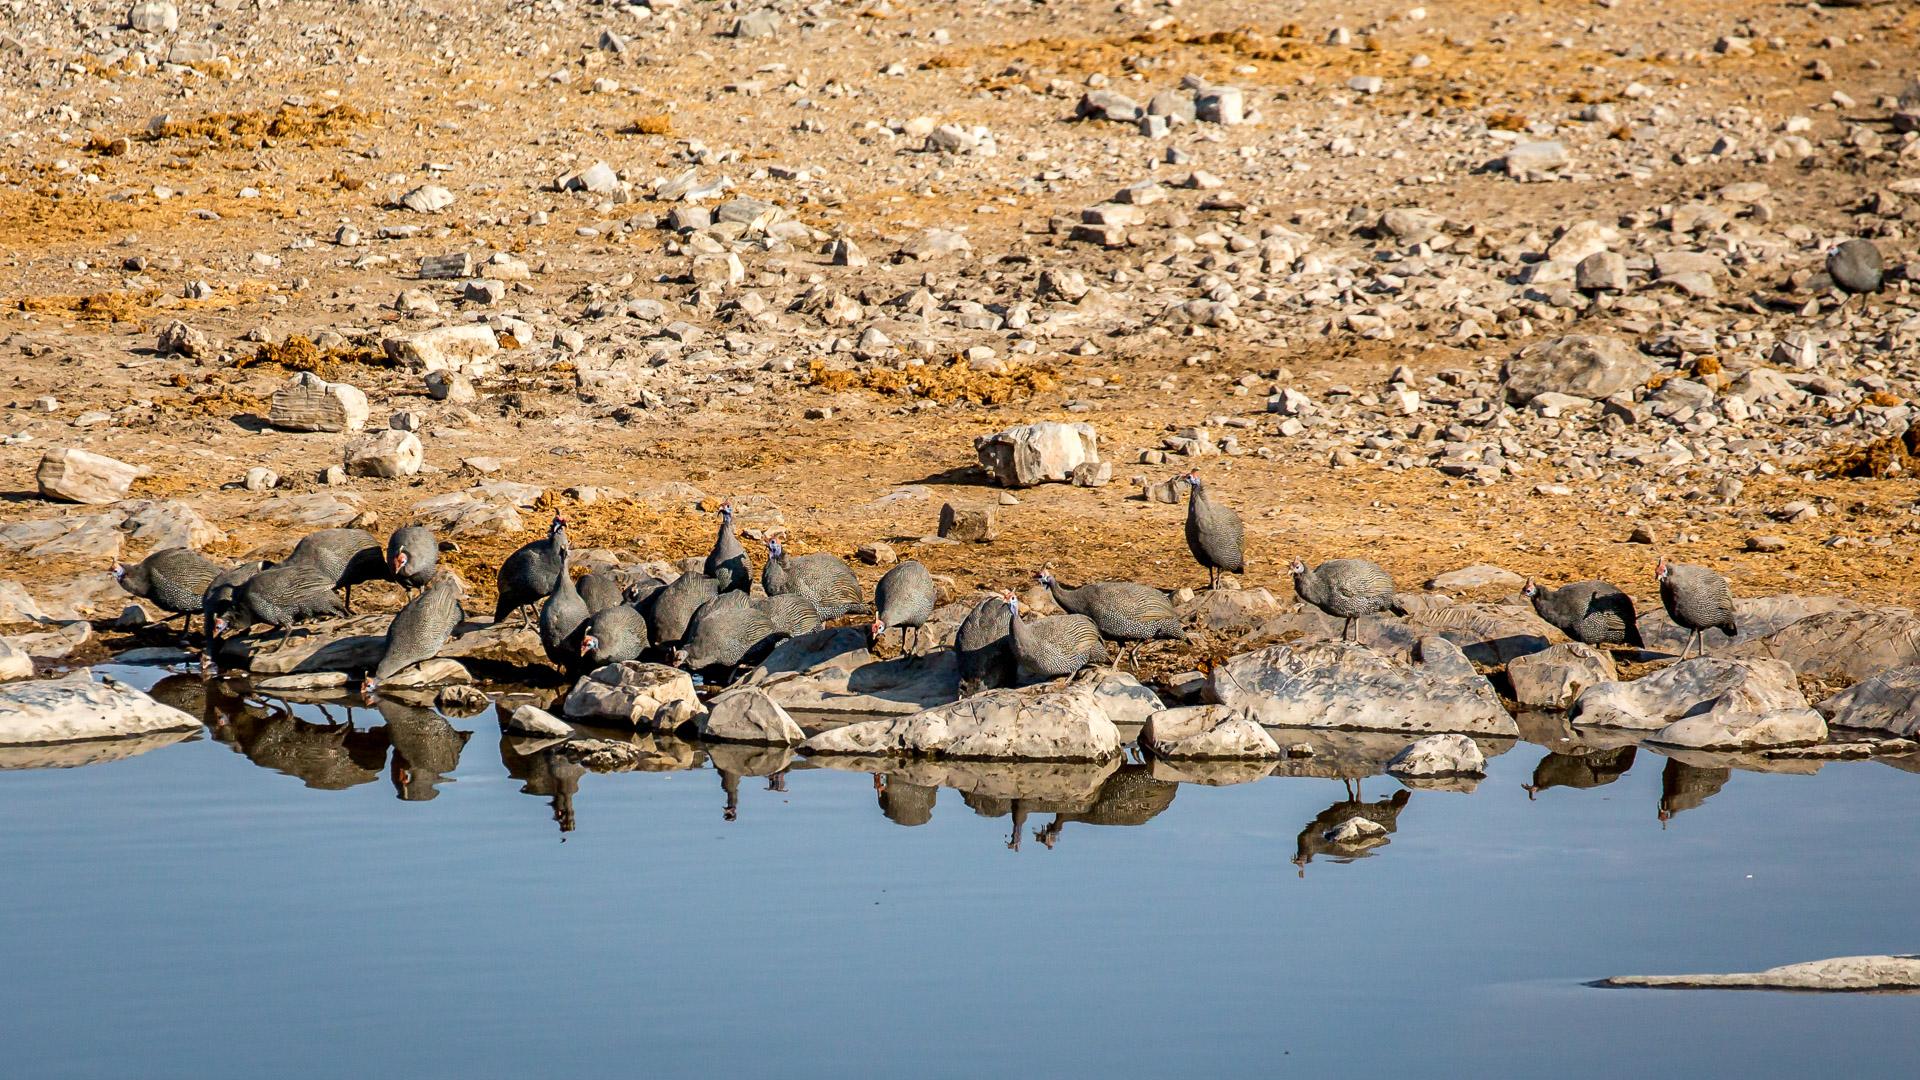 27.7. Moringa Waterhole, Halali - Guinea Fowls